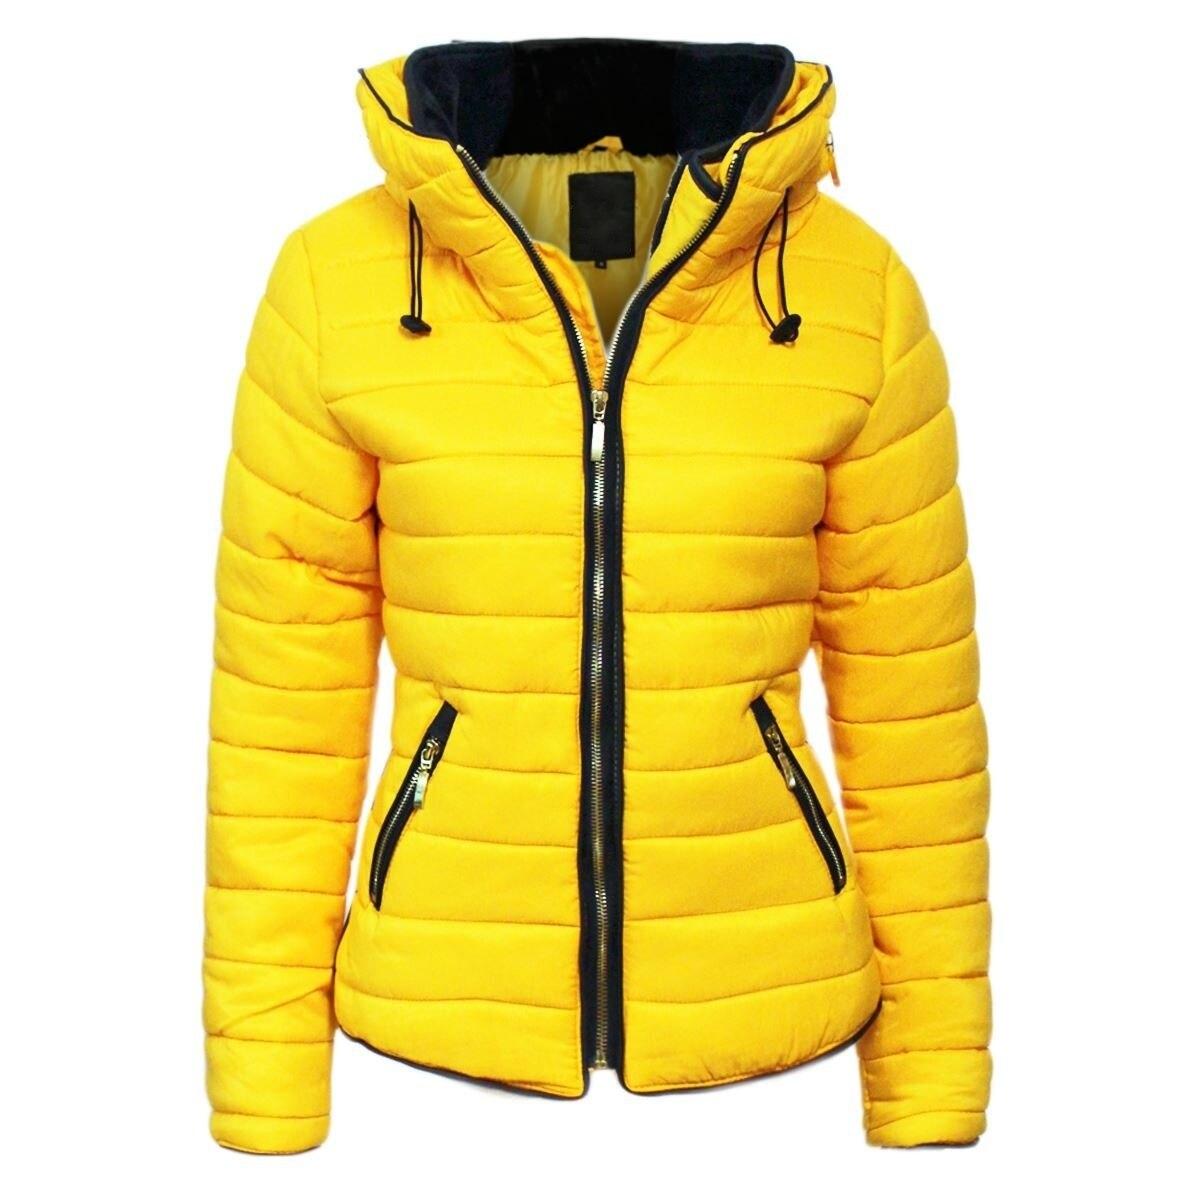 ZOGAA Woman   Parkas   Winter 2019 Puffer Jacket   Parka   Women Collar Windbreak Coats Causal Slim Fit Solid Color Winter Coat   Parkas